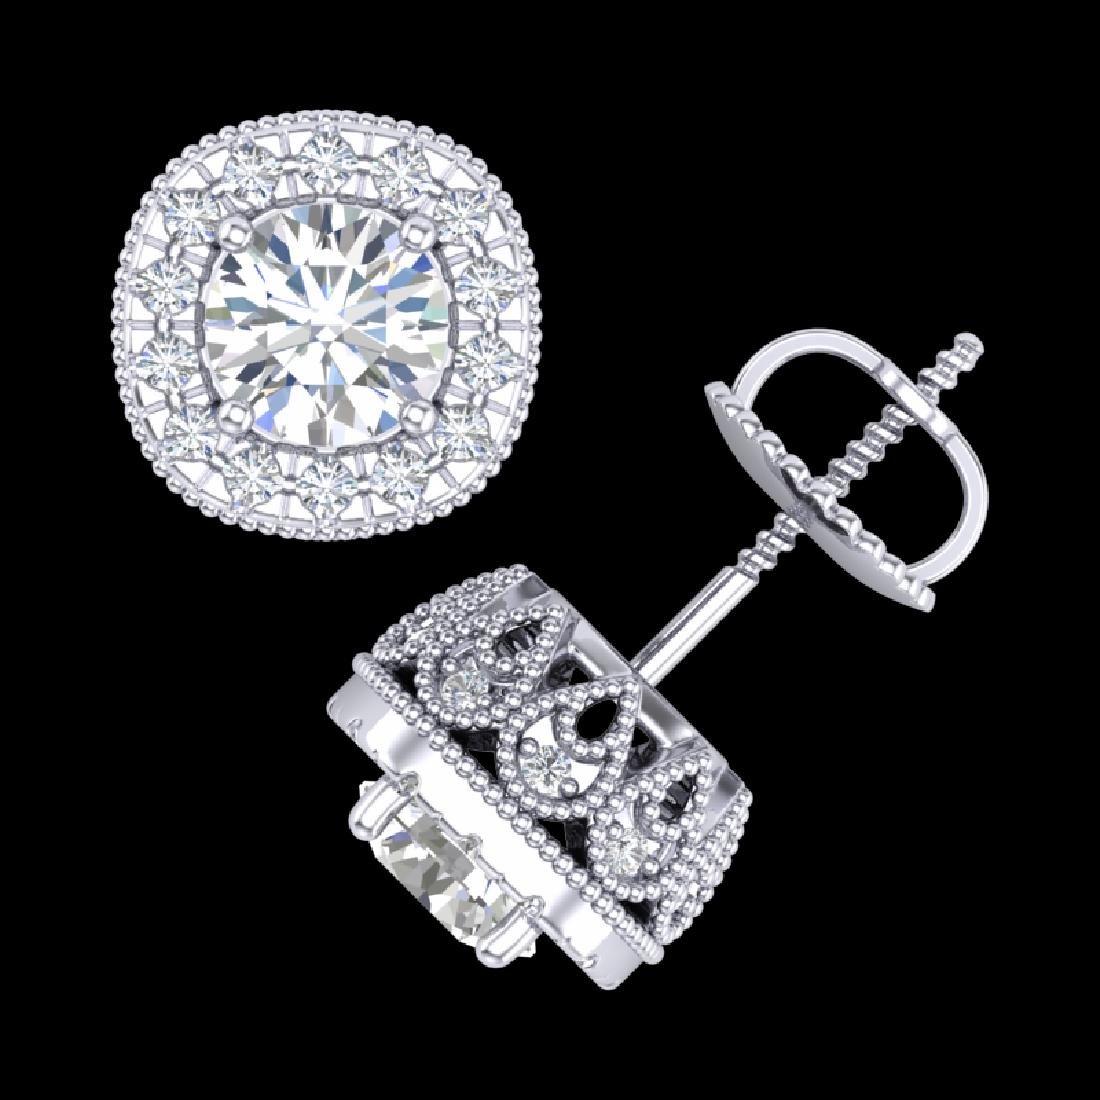 1.69 CTW VS/SI Diamond Solitaire Art Deco Stud Earrings - 3